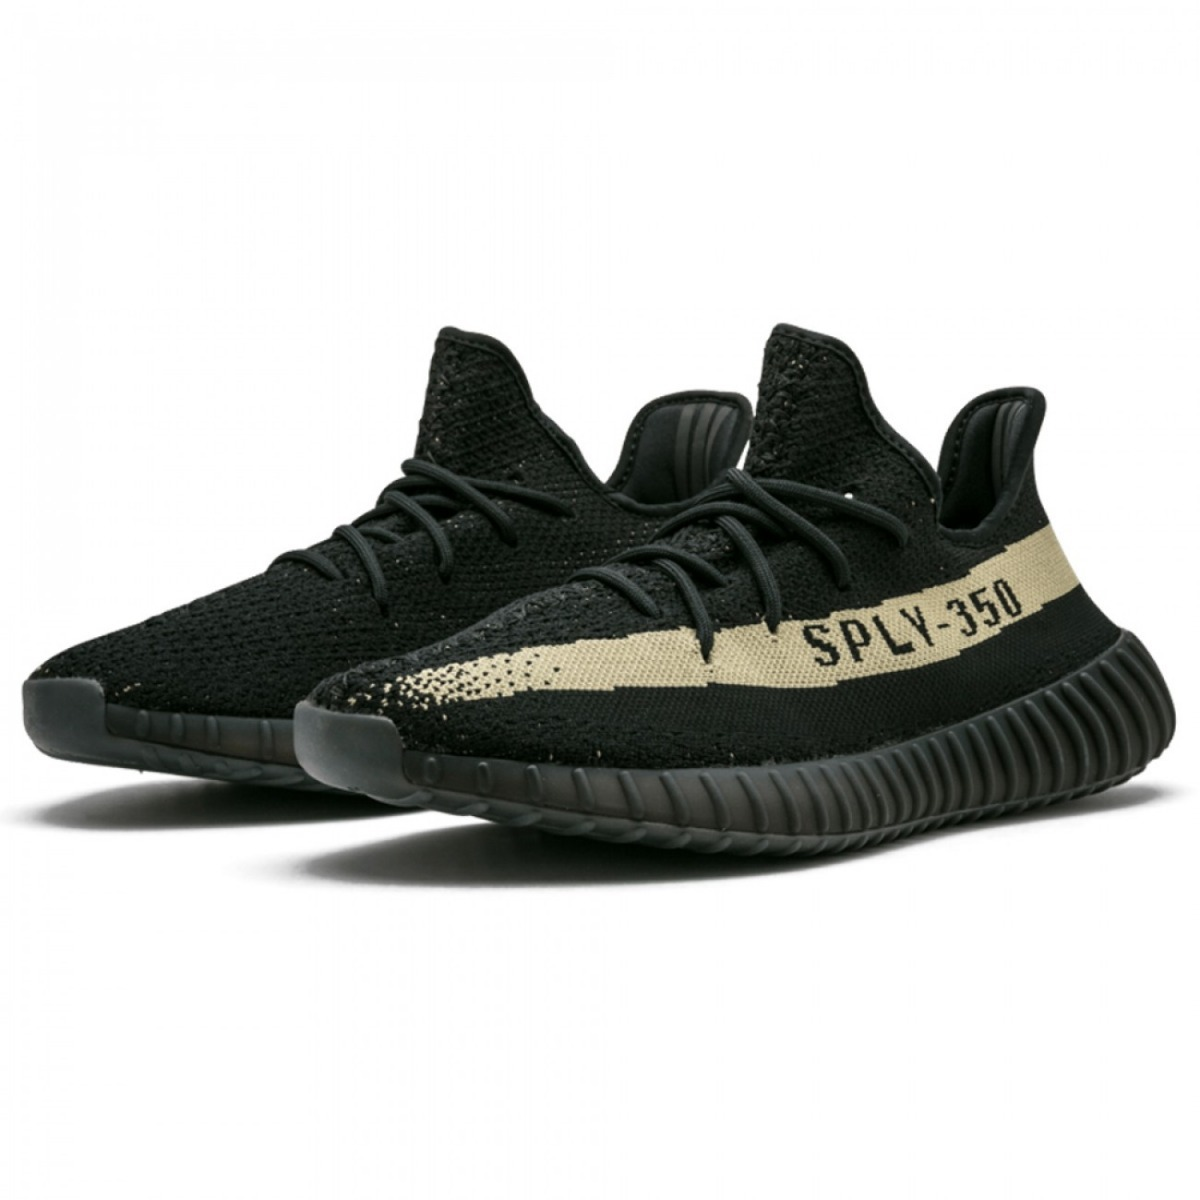 tênis adidas yeezy boost 350 cores importado oferta black. Carregando zoom. 9b91a9c437eab